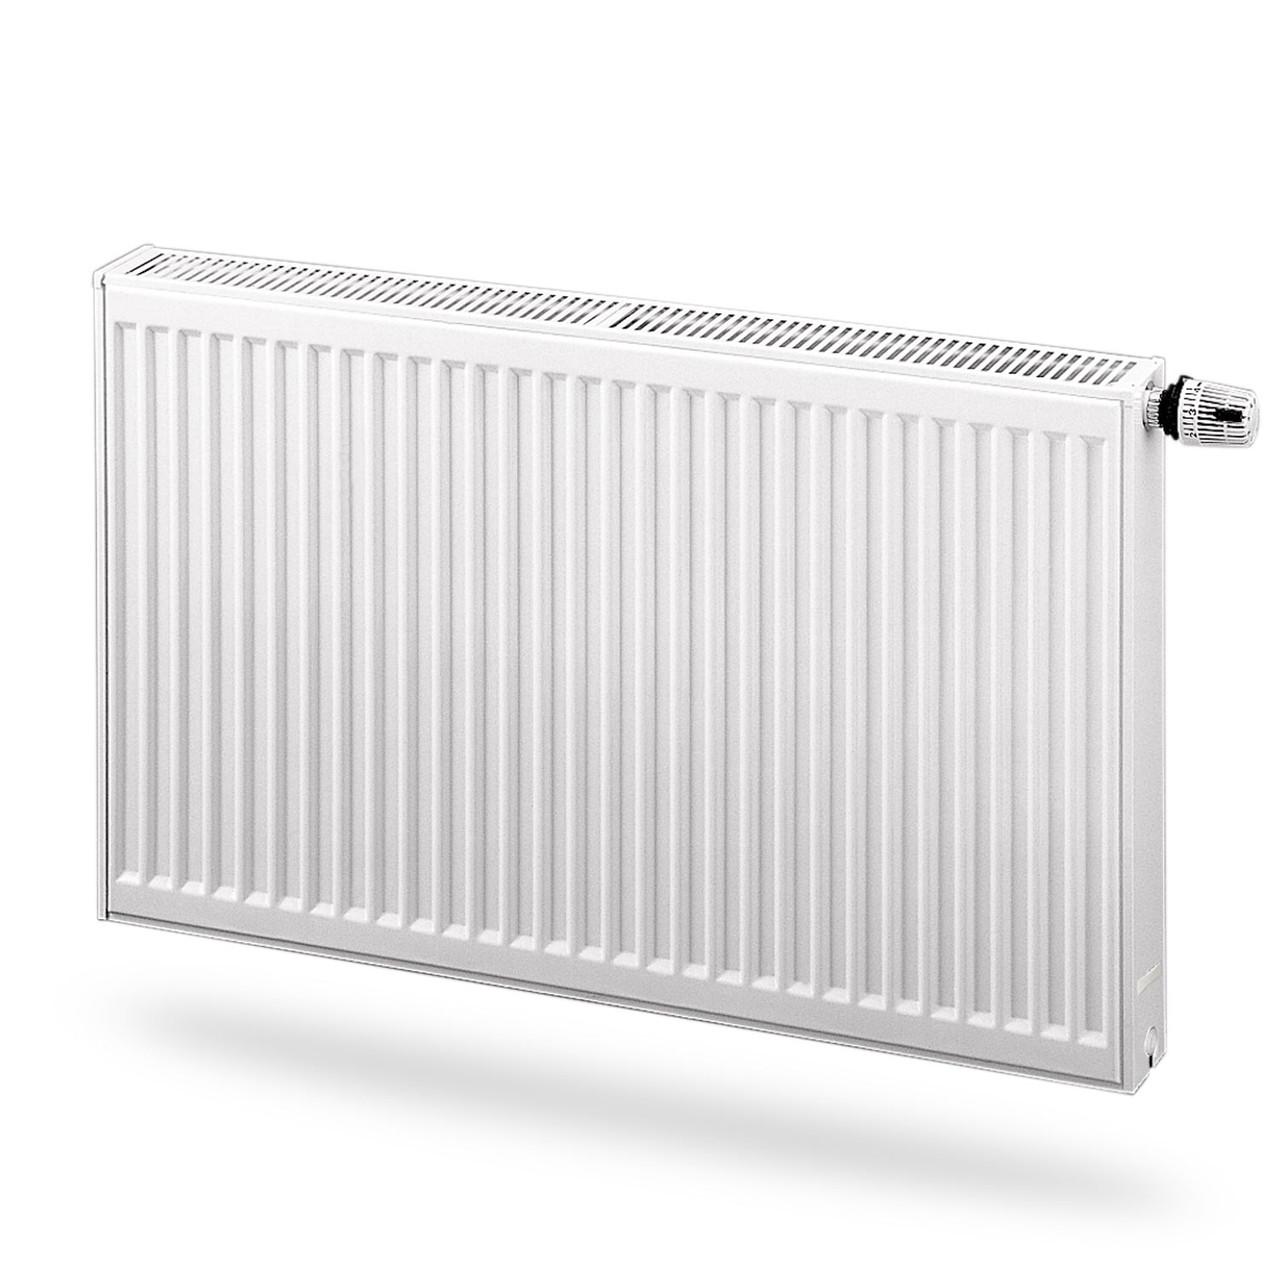 Стальной радиатор Purmo Ventil Compact 500х22х1200 нижн.